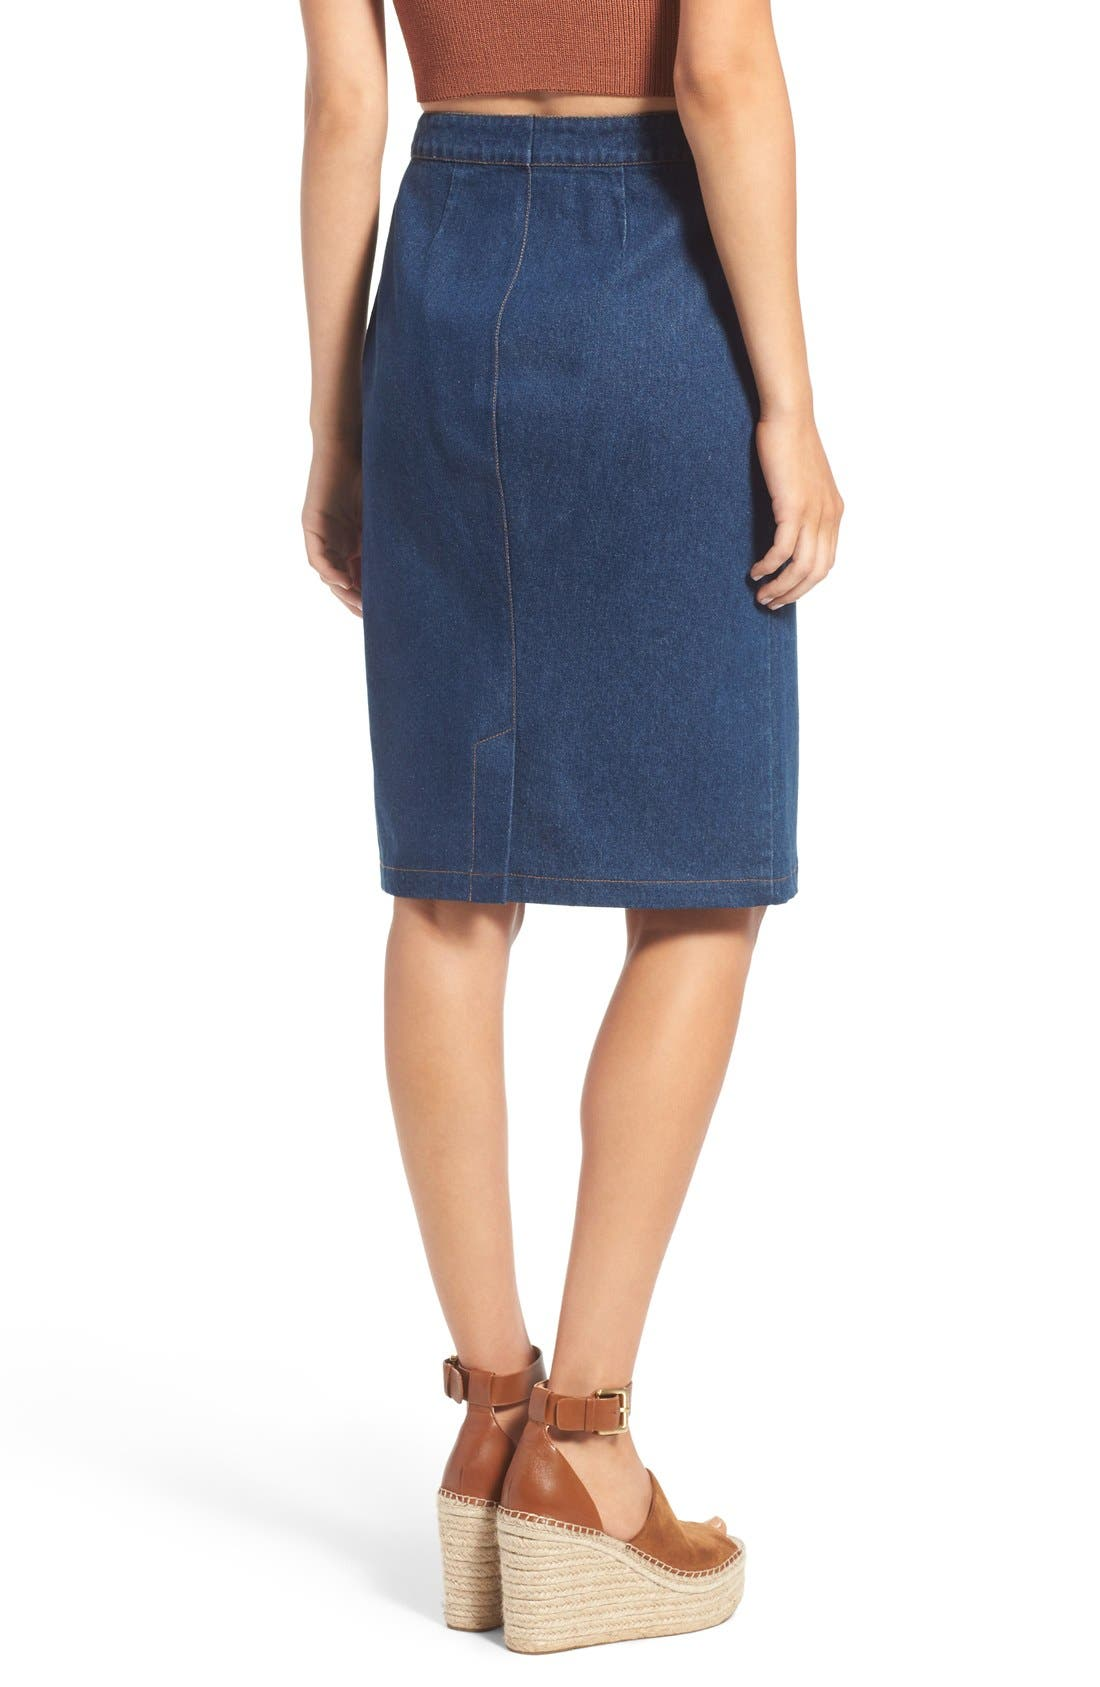 Alternate Image 2  - ASTR 'Francisca' Button Front Denim Skirt